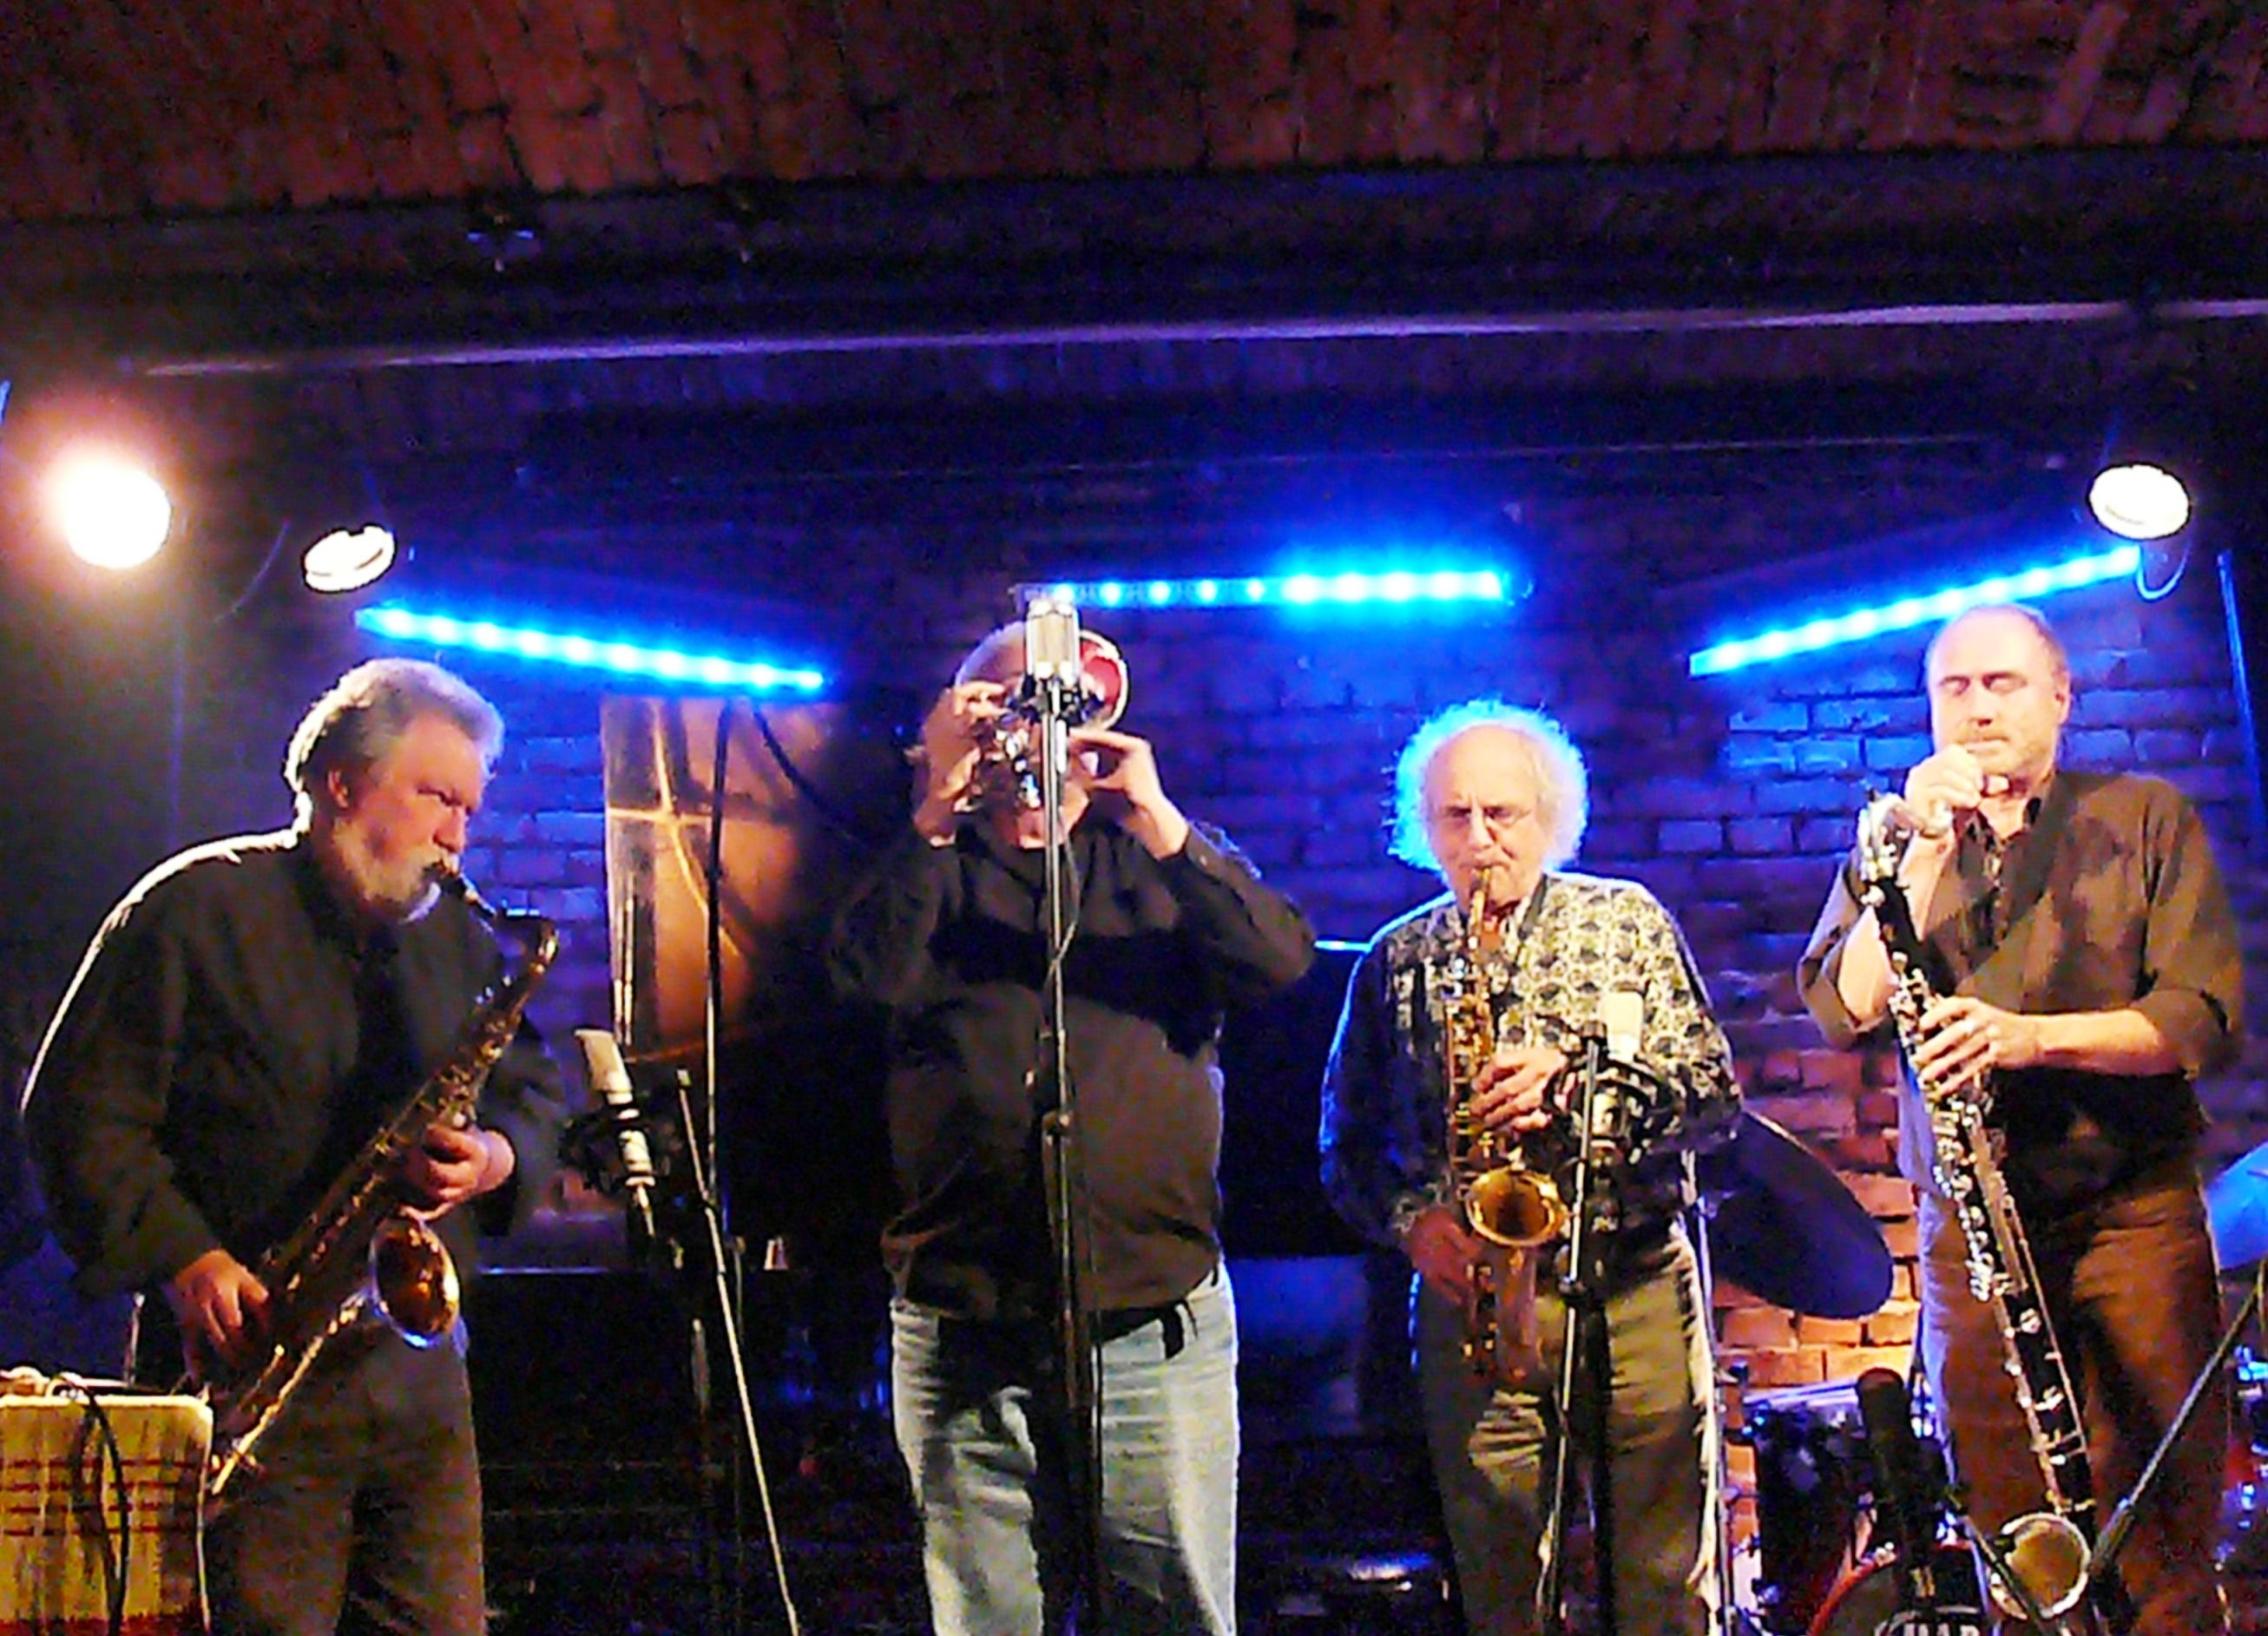 Evan Parker, Herb Robertson, Trevor Watts and Hans Koch at Alchemia, Krakow in November 2012